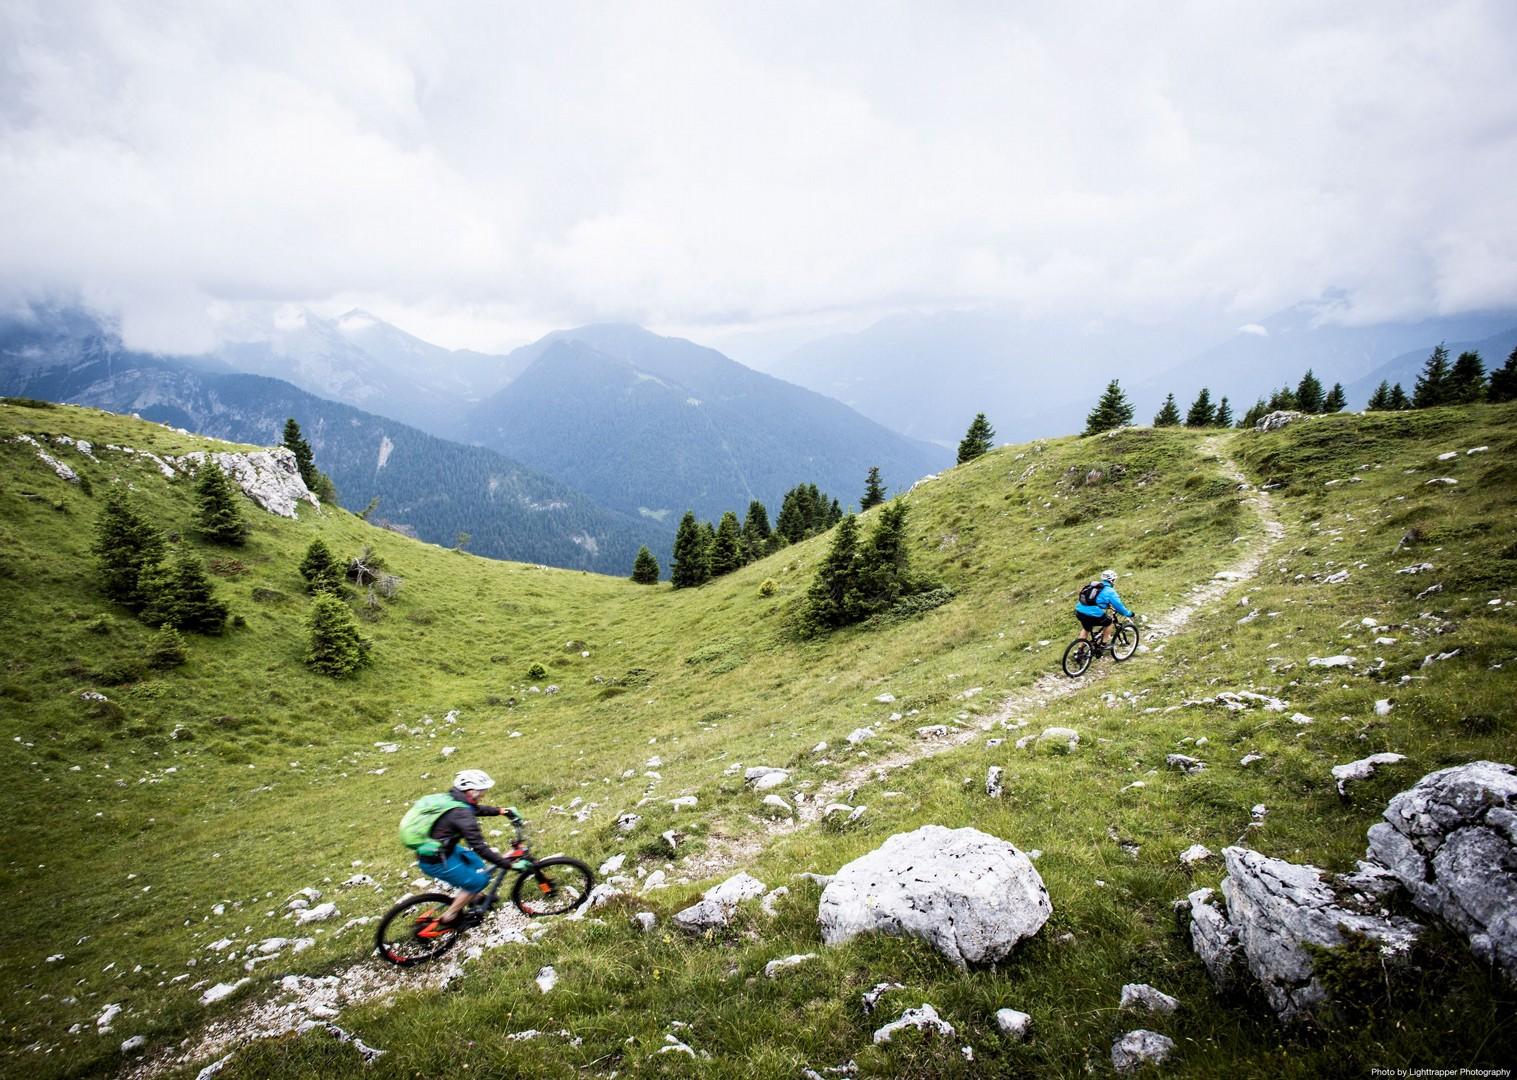 saddle_skedaddle_italy_2017_day6_brenta_dolomites_205.jpg - Italy and France - Alpine Adventure - Mountain Biking